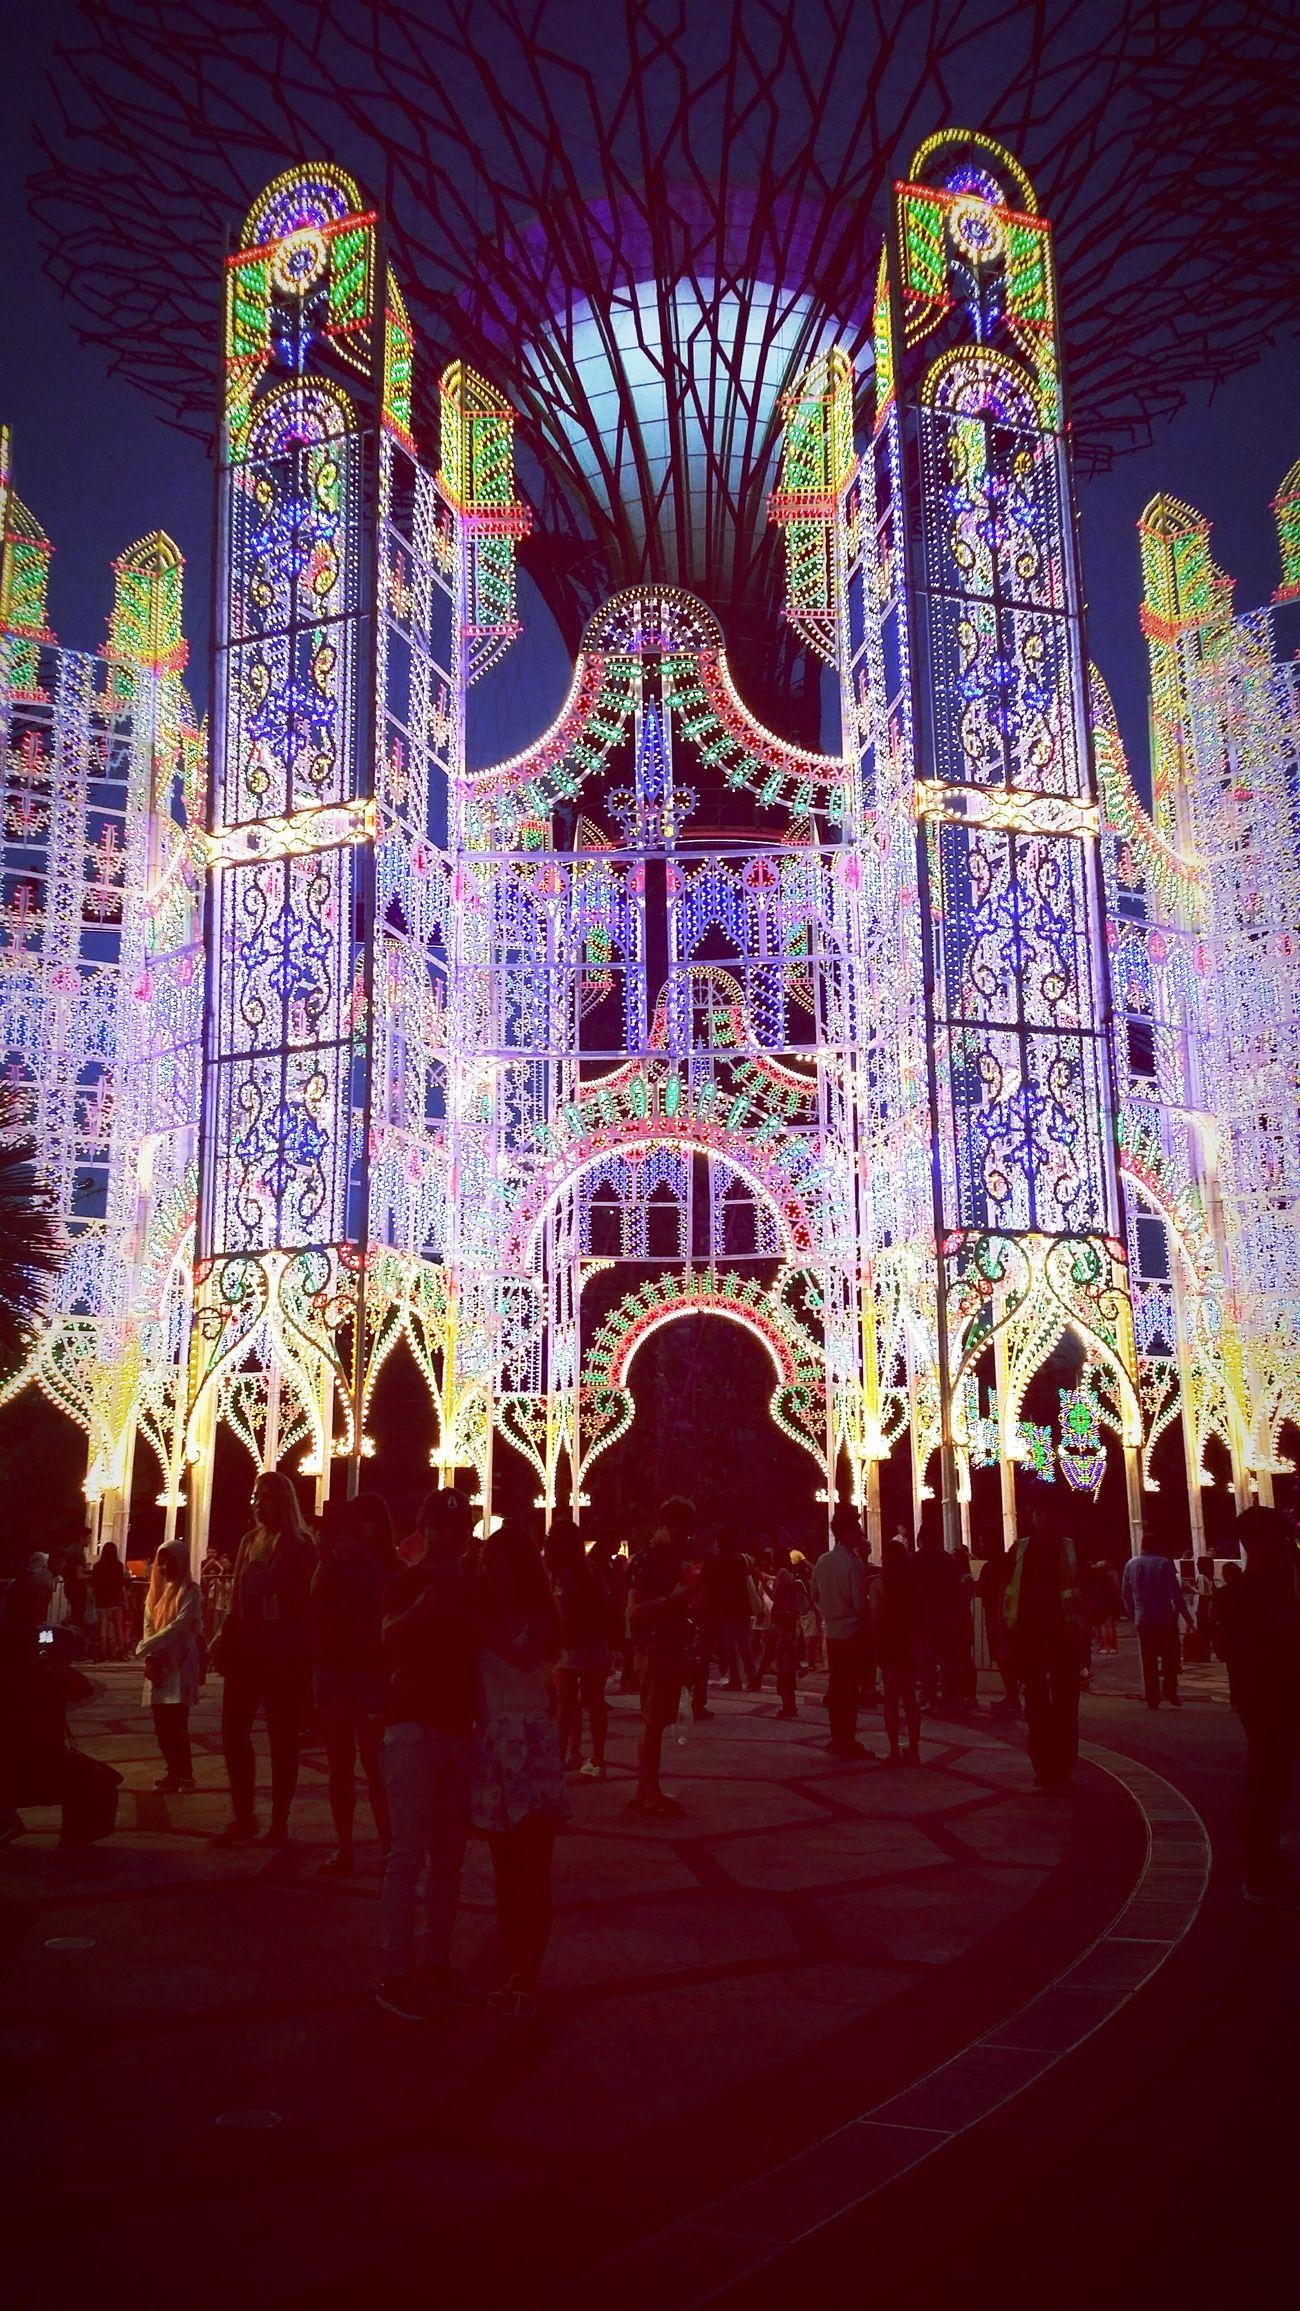 Christmaswonderlandsg Christmaswonderland MerryChristmas Illuminated Night Sky Celebration Christmas Lights Outdoors Multi Colored